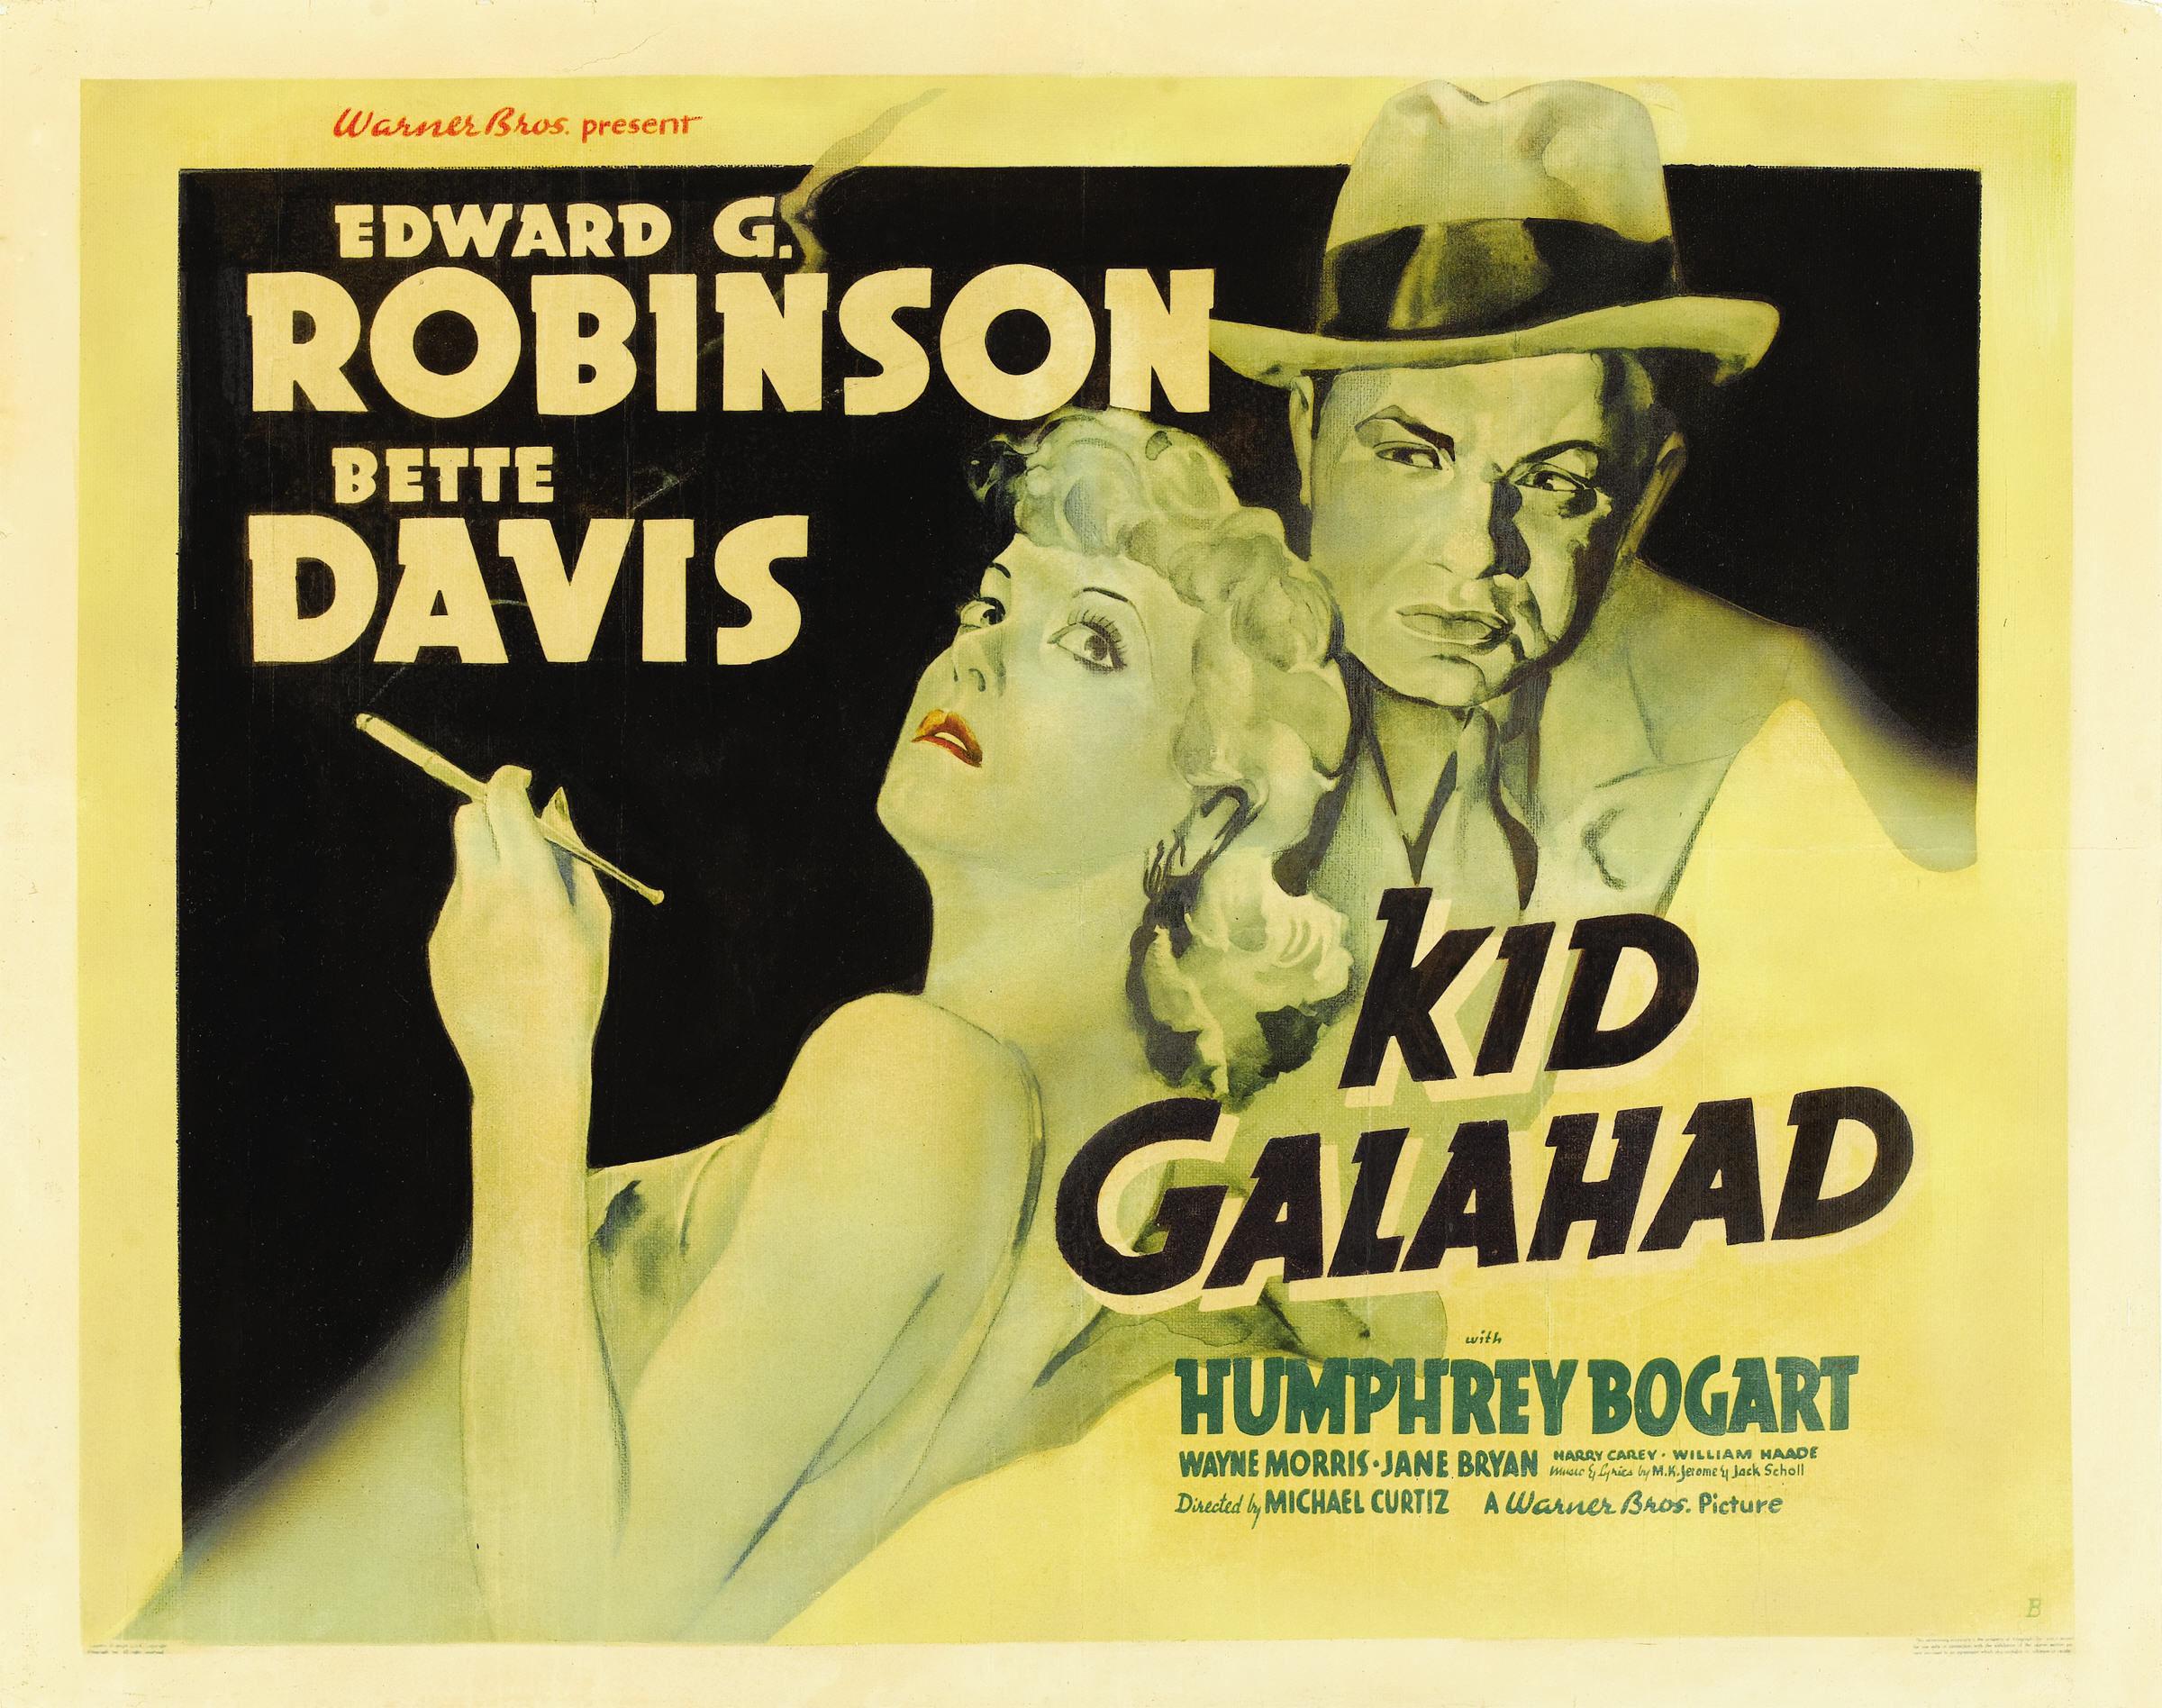 Bette Davis and Edward G. Robinson in Kid Galahad (1937)